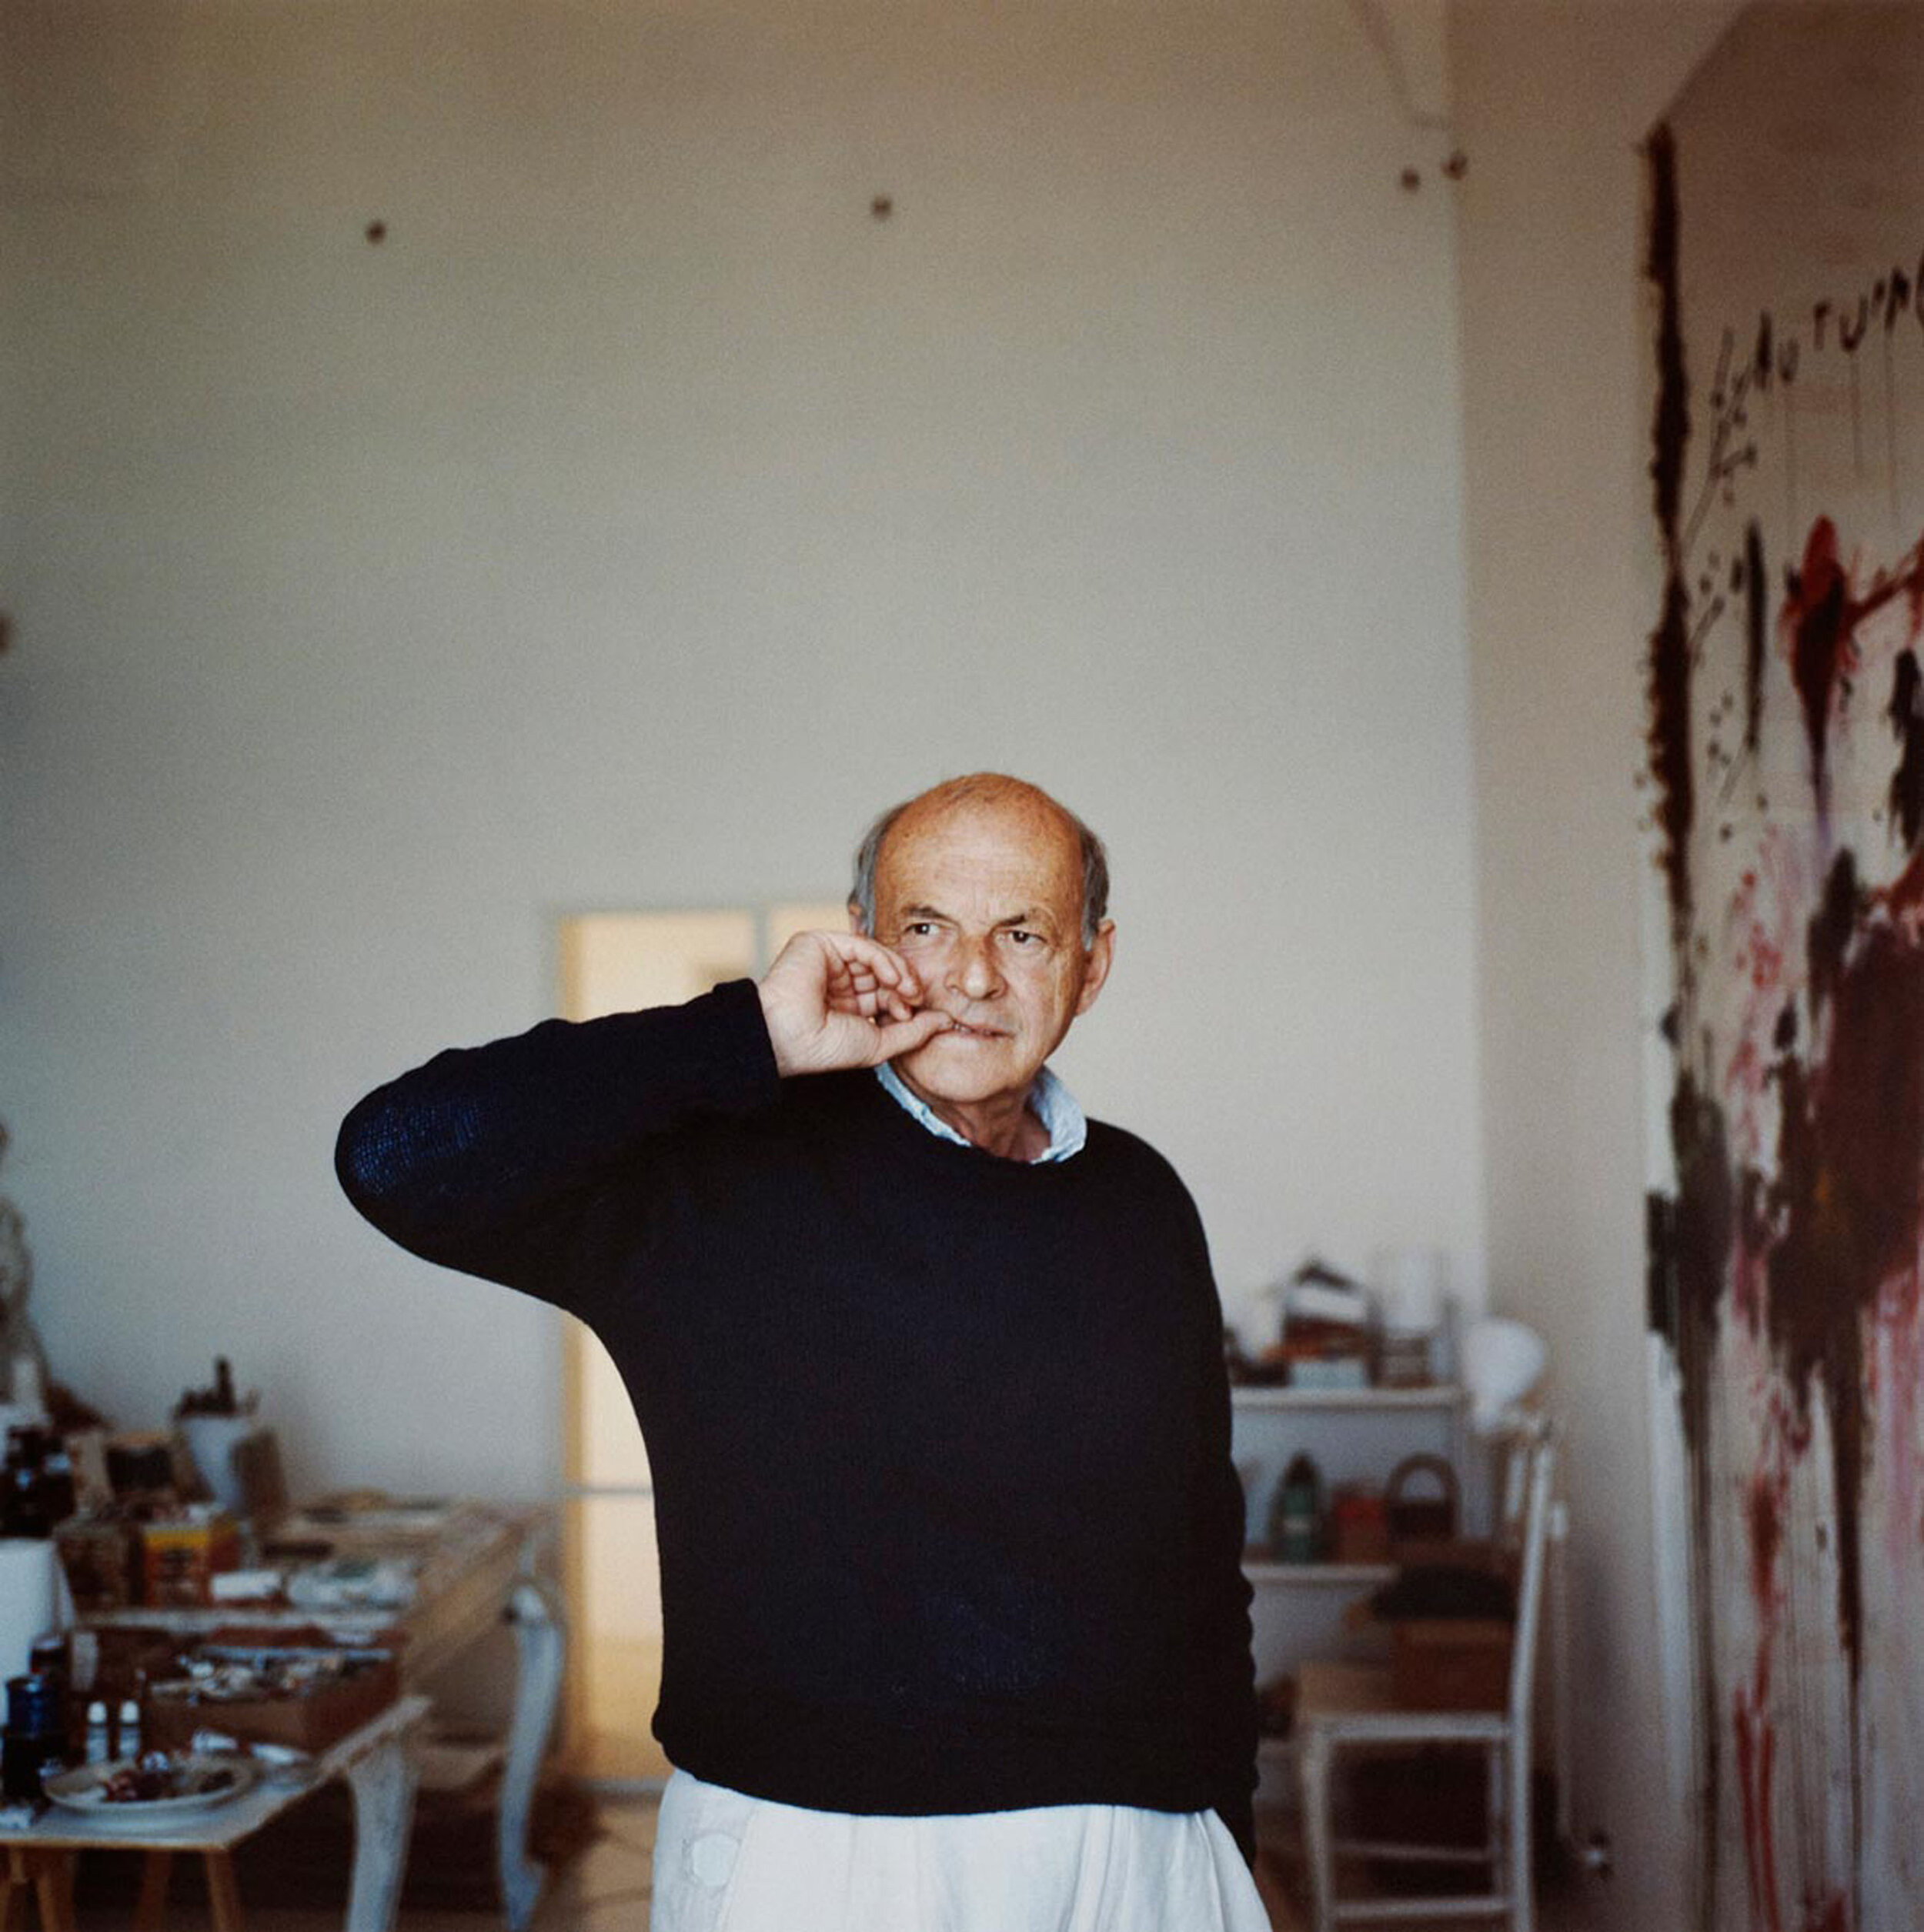 Cy-Twombly-by-François-Halard-1995.jpg